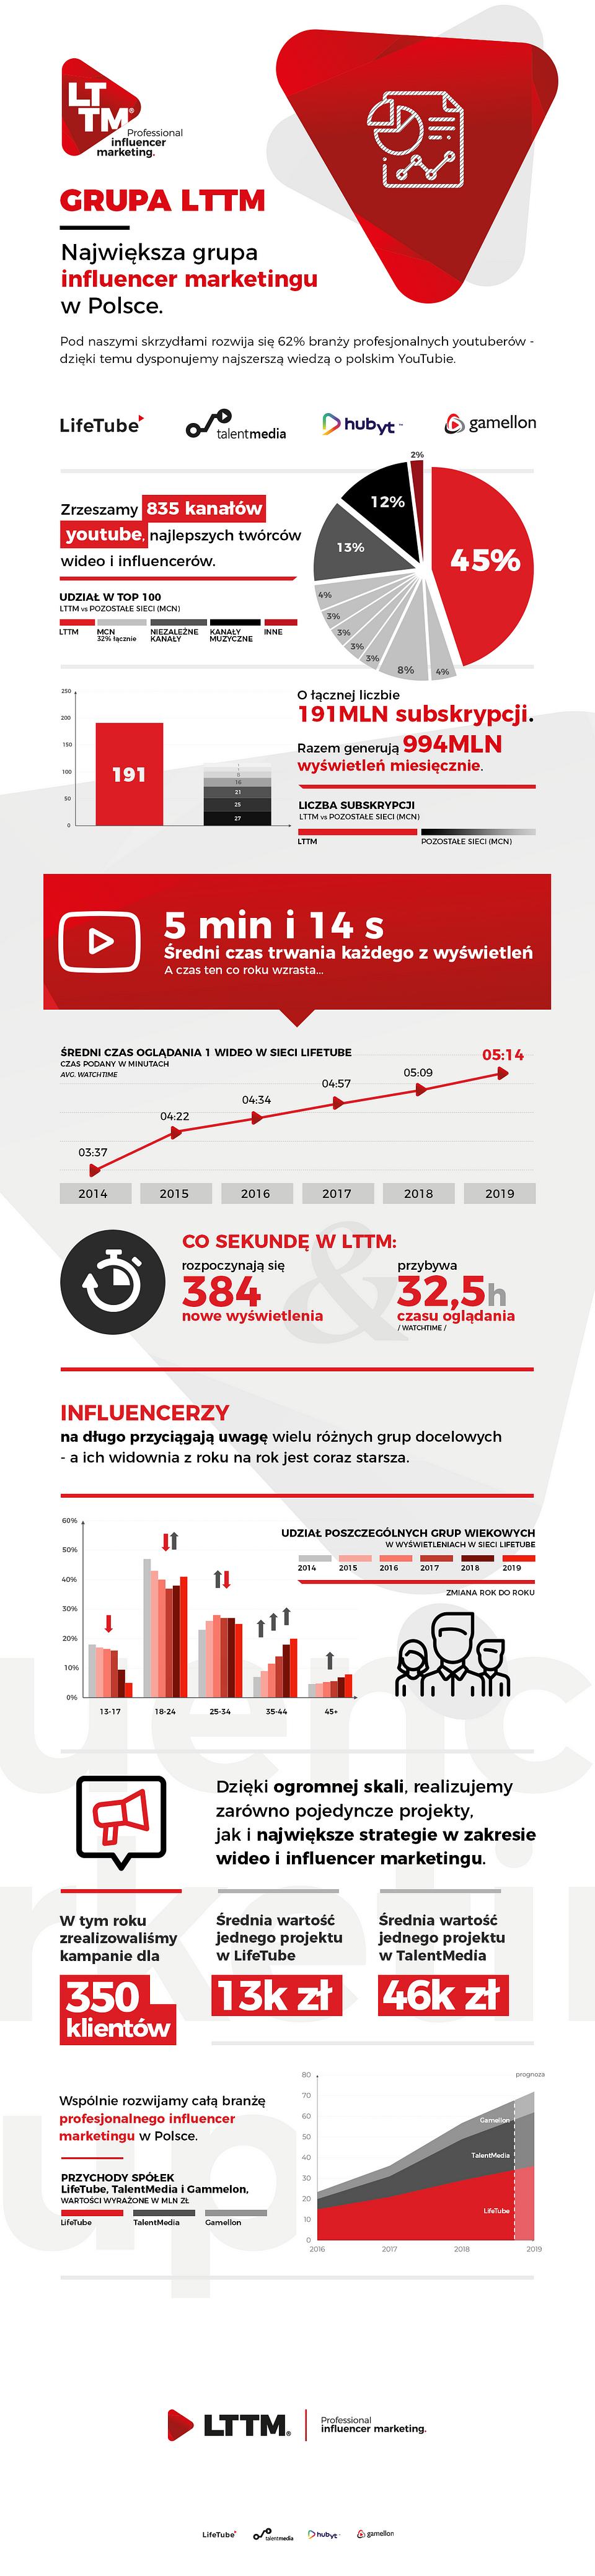 infografika_FINAL.png